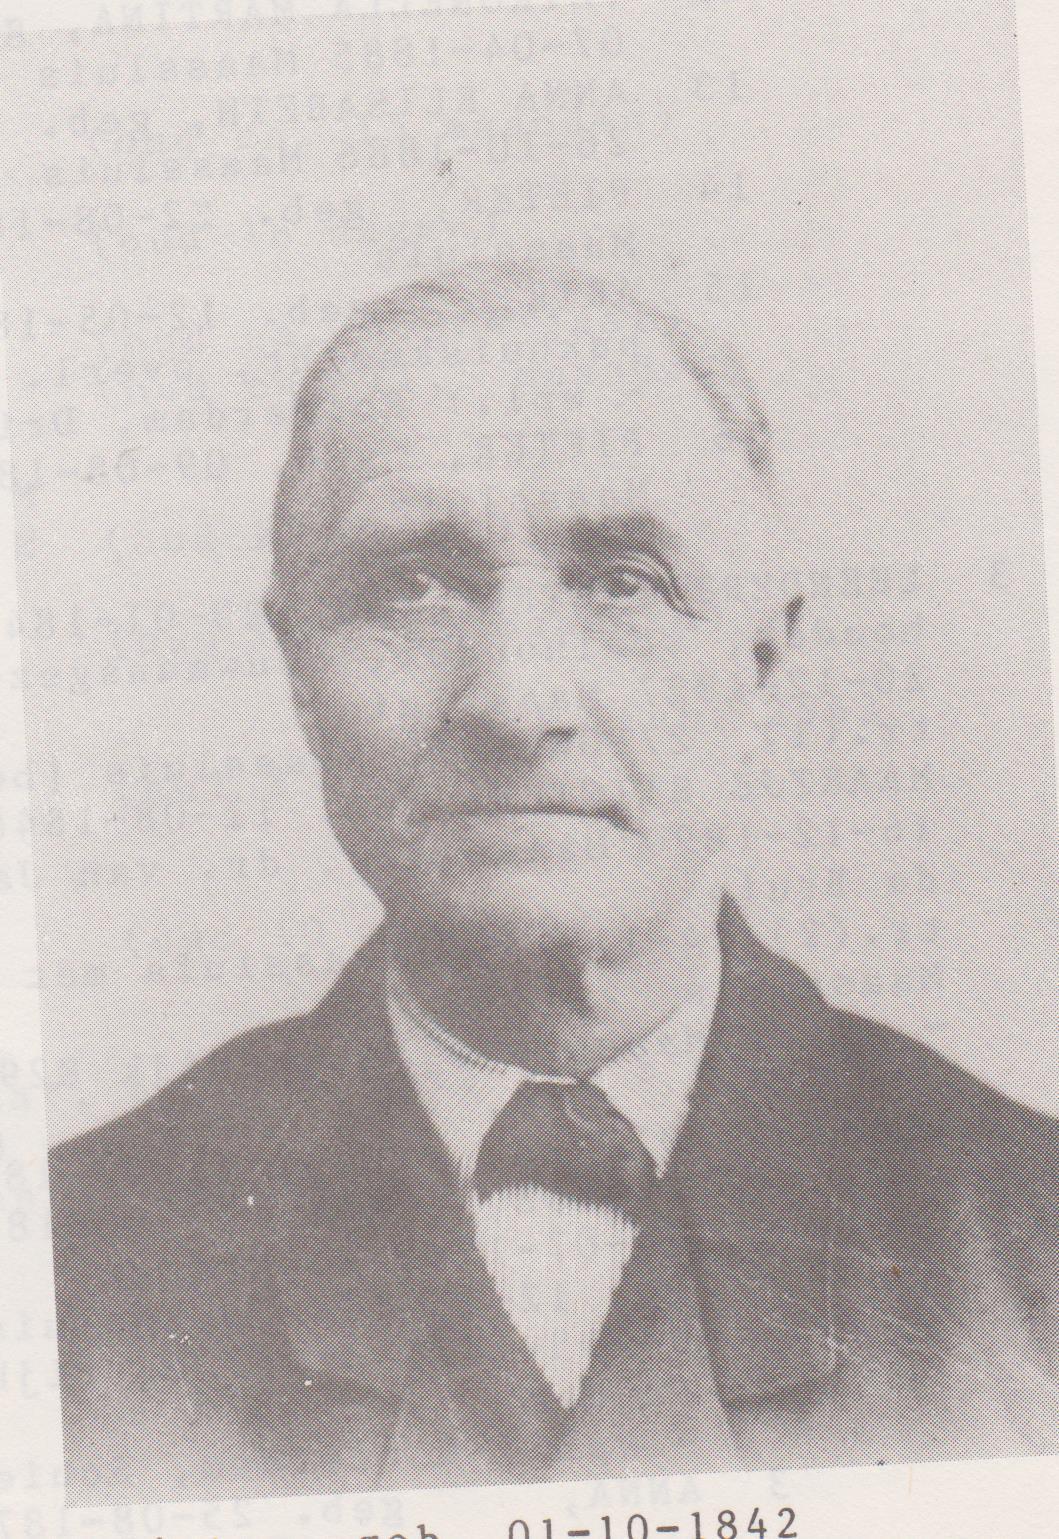 Pieter Buitelaar 01-10-1842